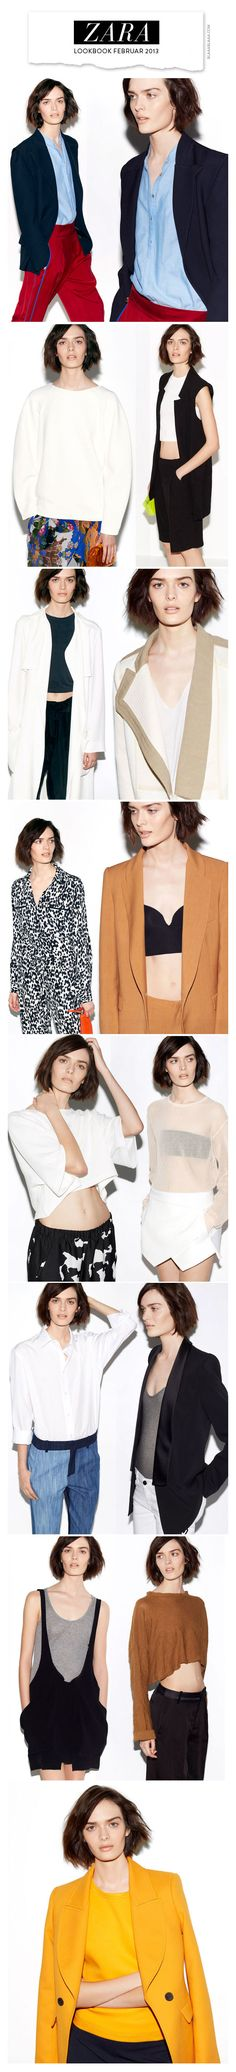 Zara Lookbook Woman Februar 2013